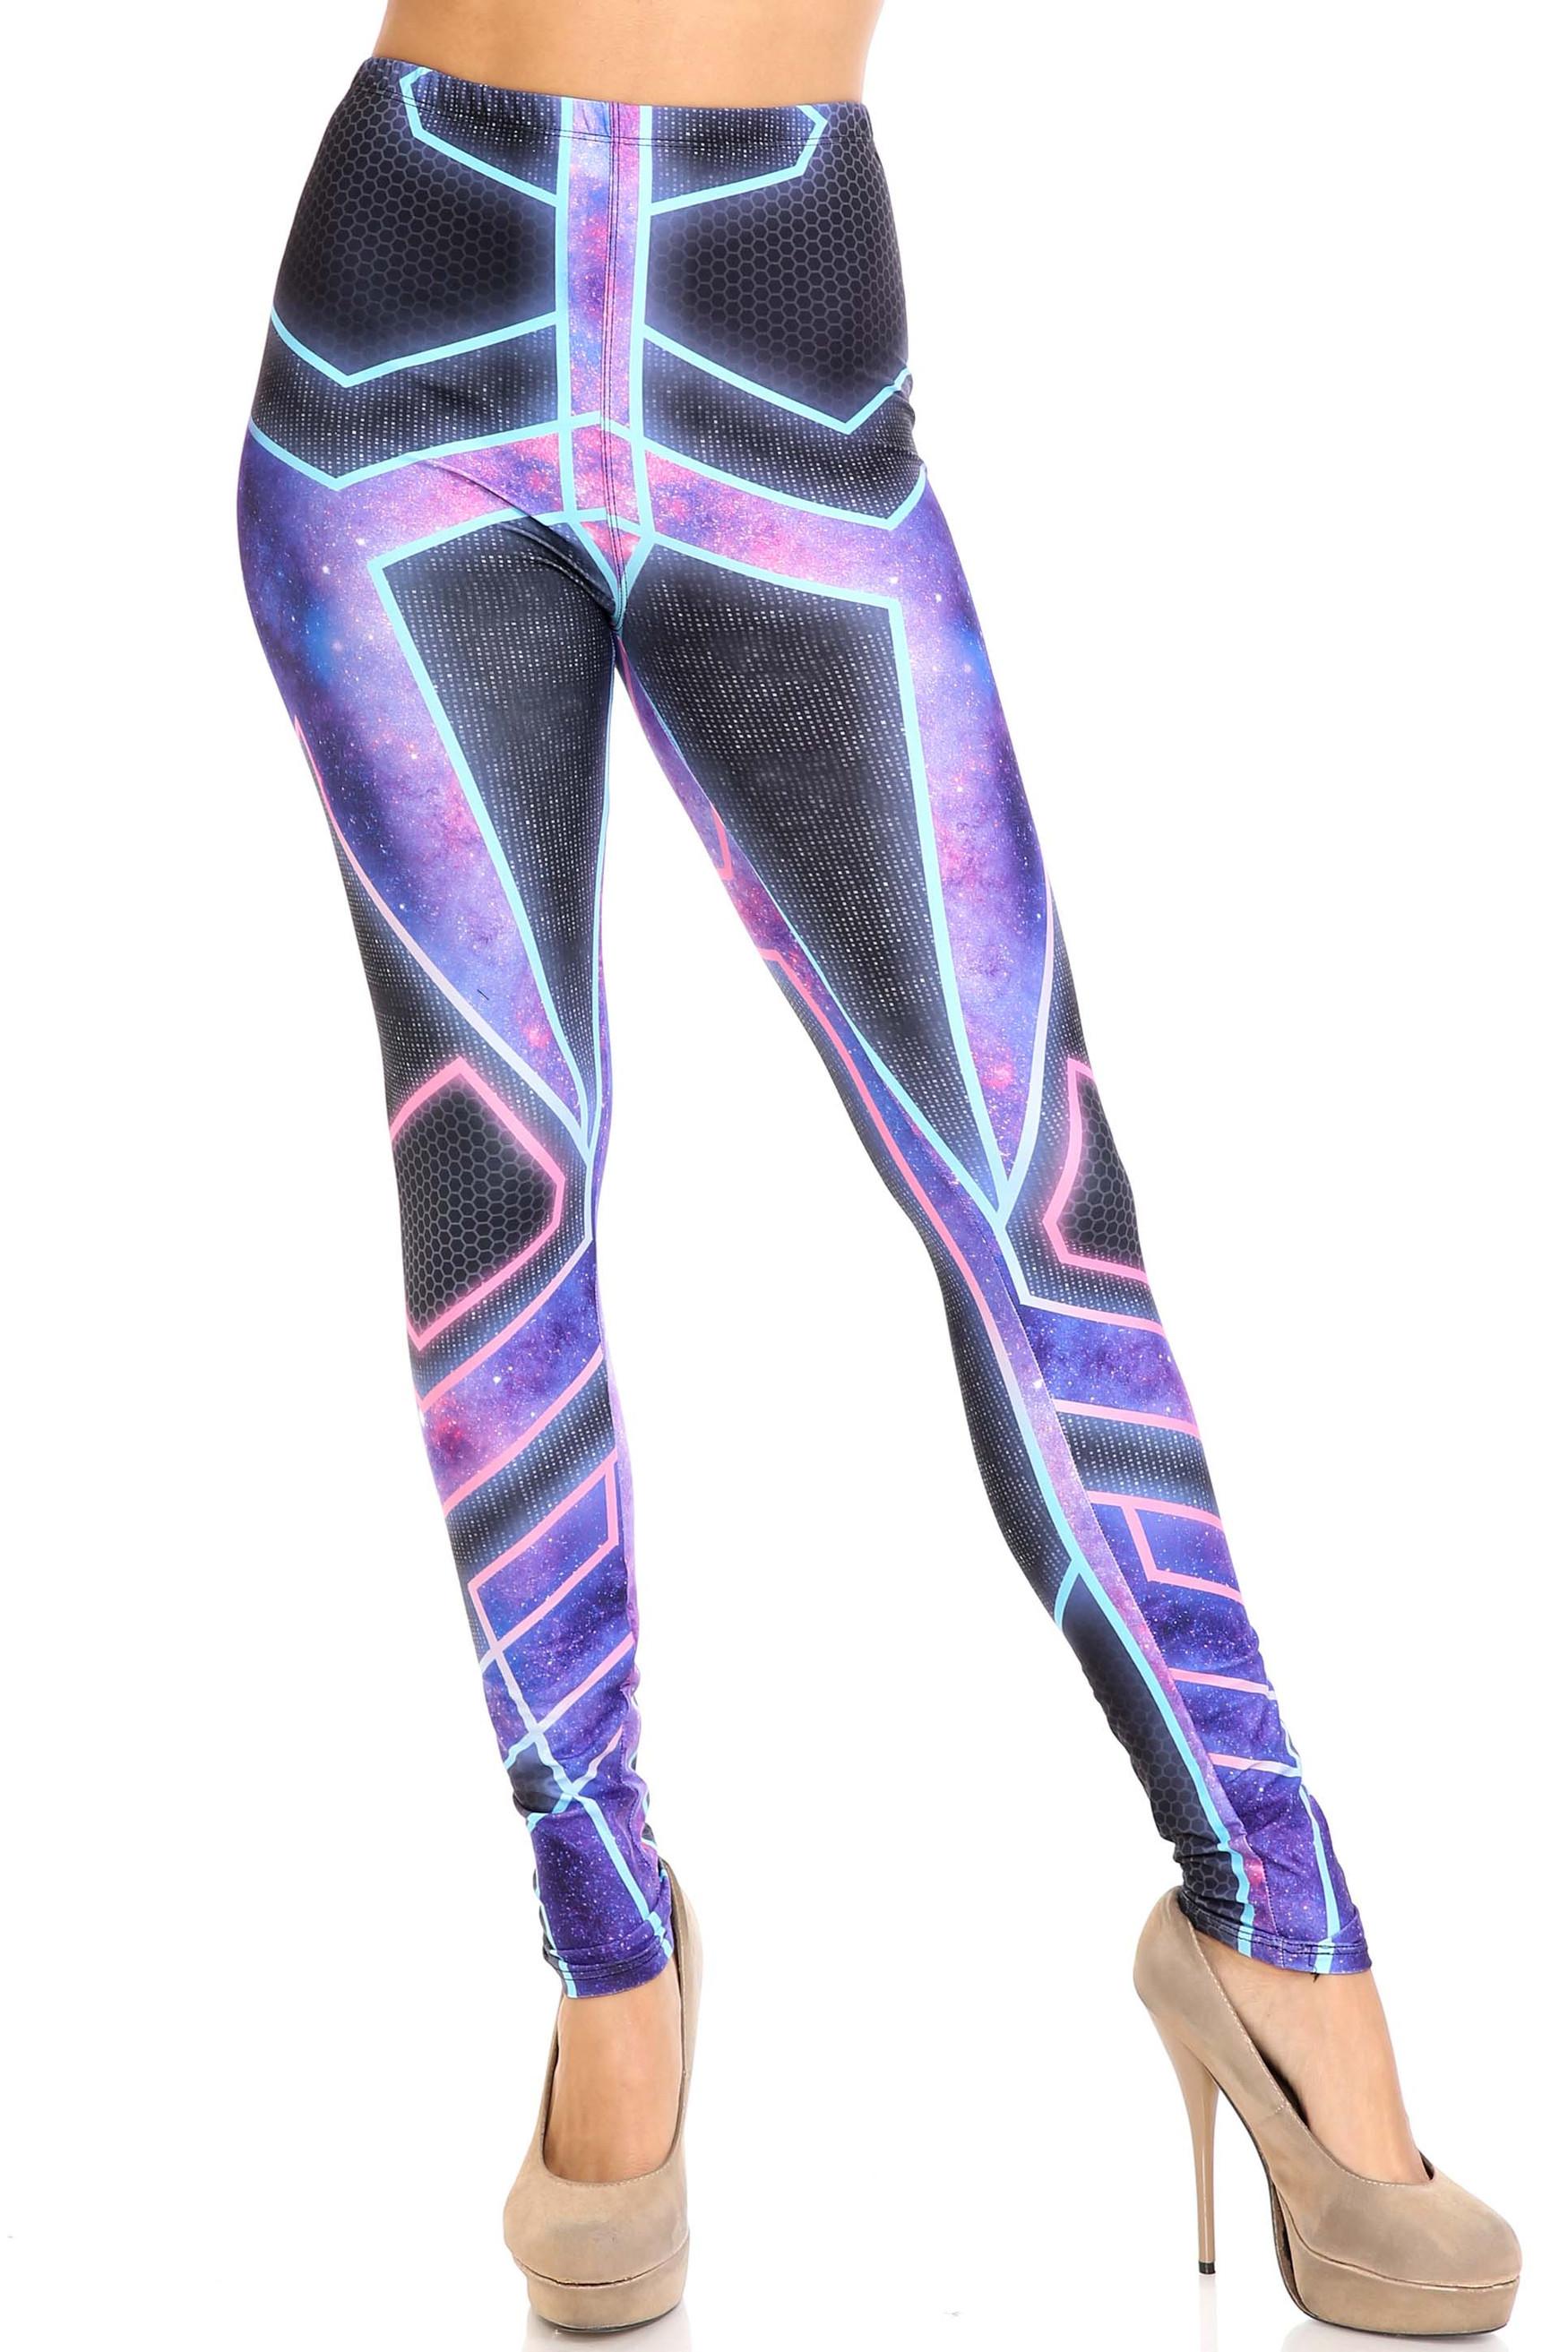 Creamy Soft Futura Extra Plus Size Leggings - 3X-5X - USA Fashion™